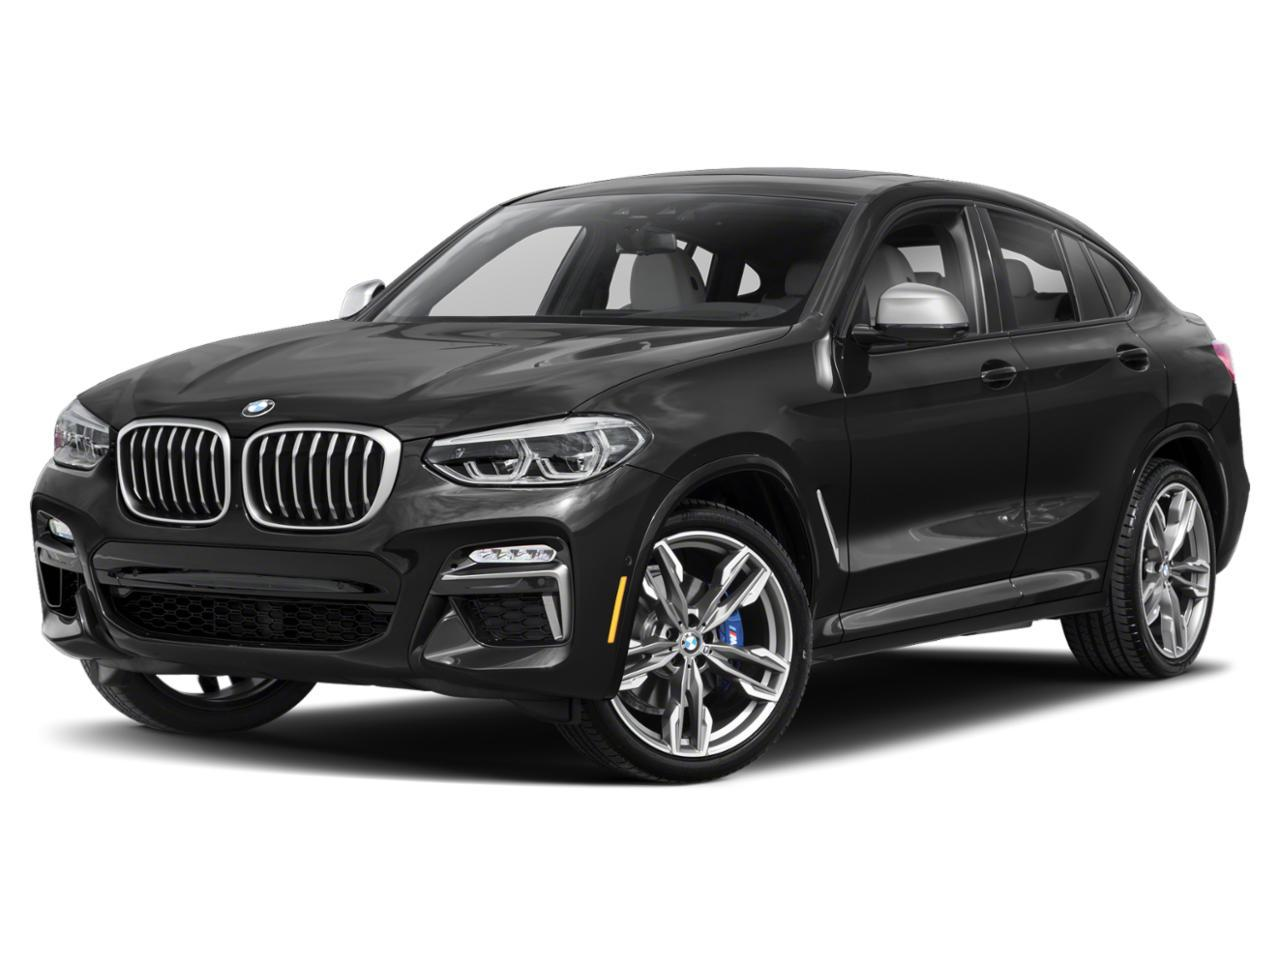 2021 BMW X4 M40i Vehicle Photo in Grapevine, TX 76051